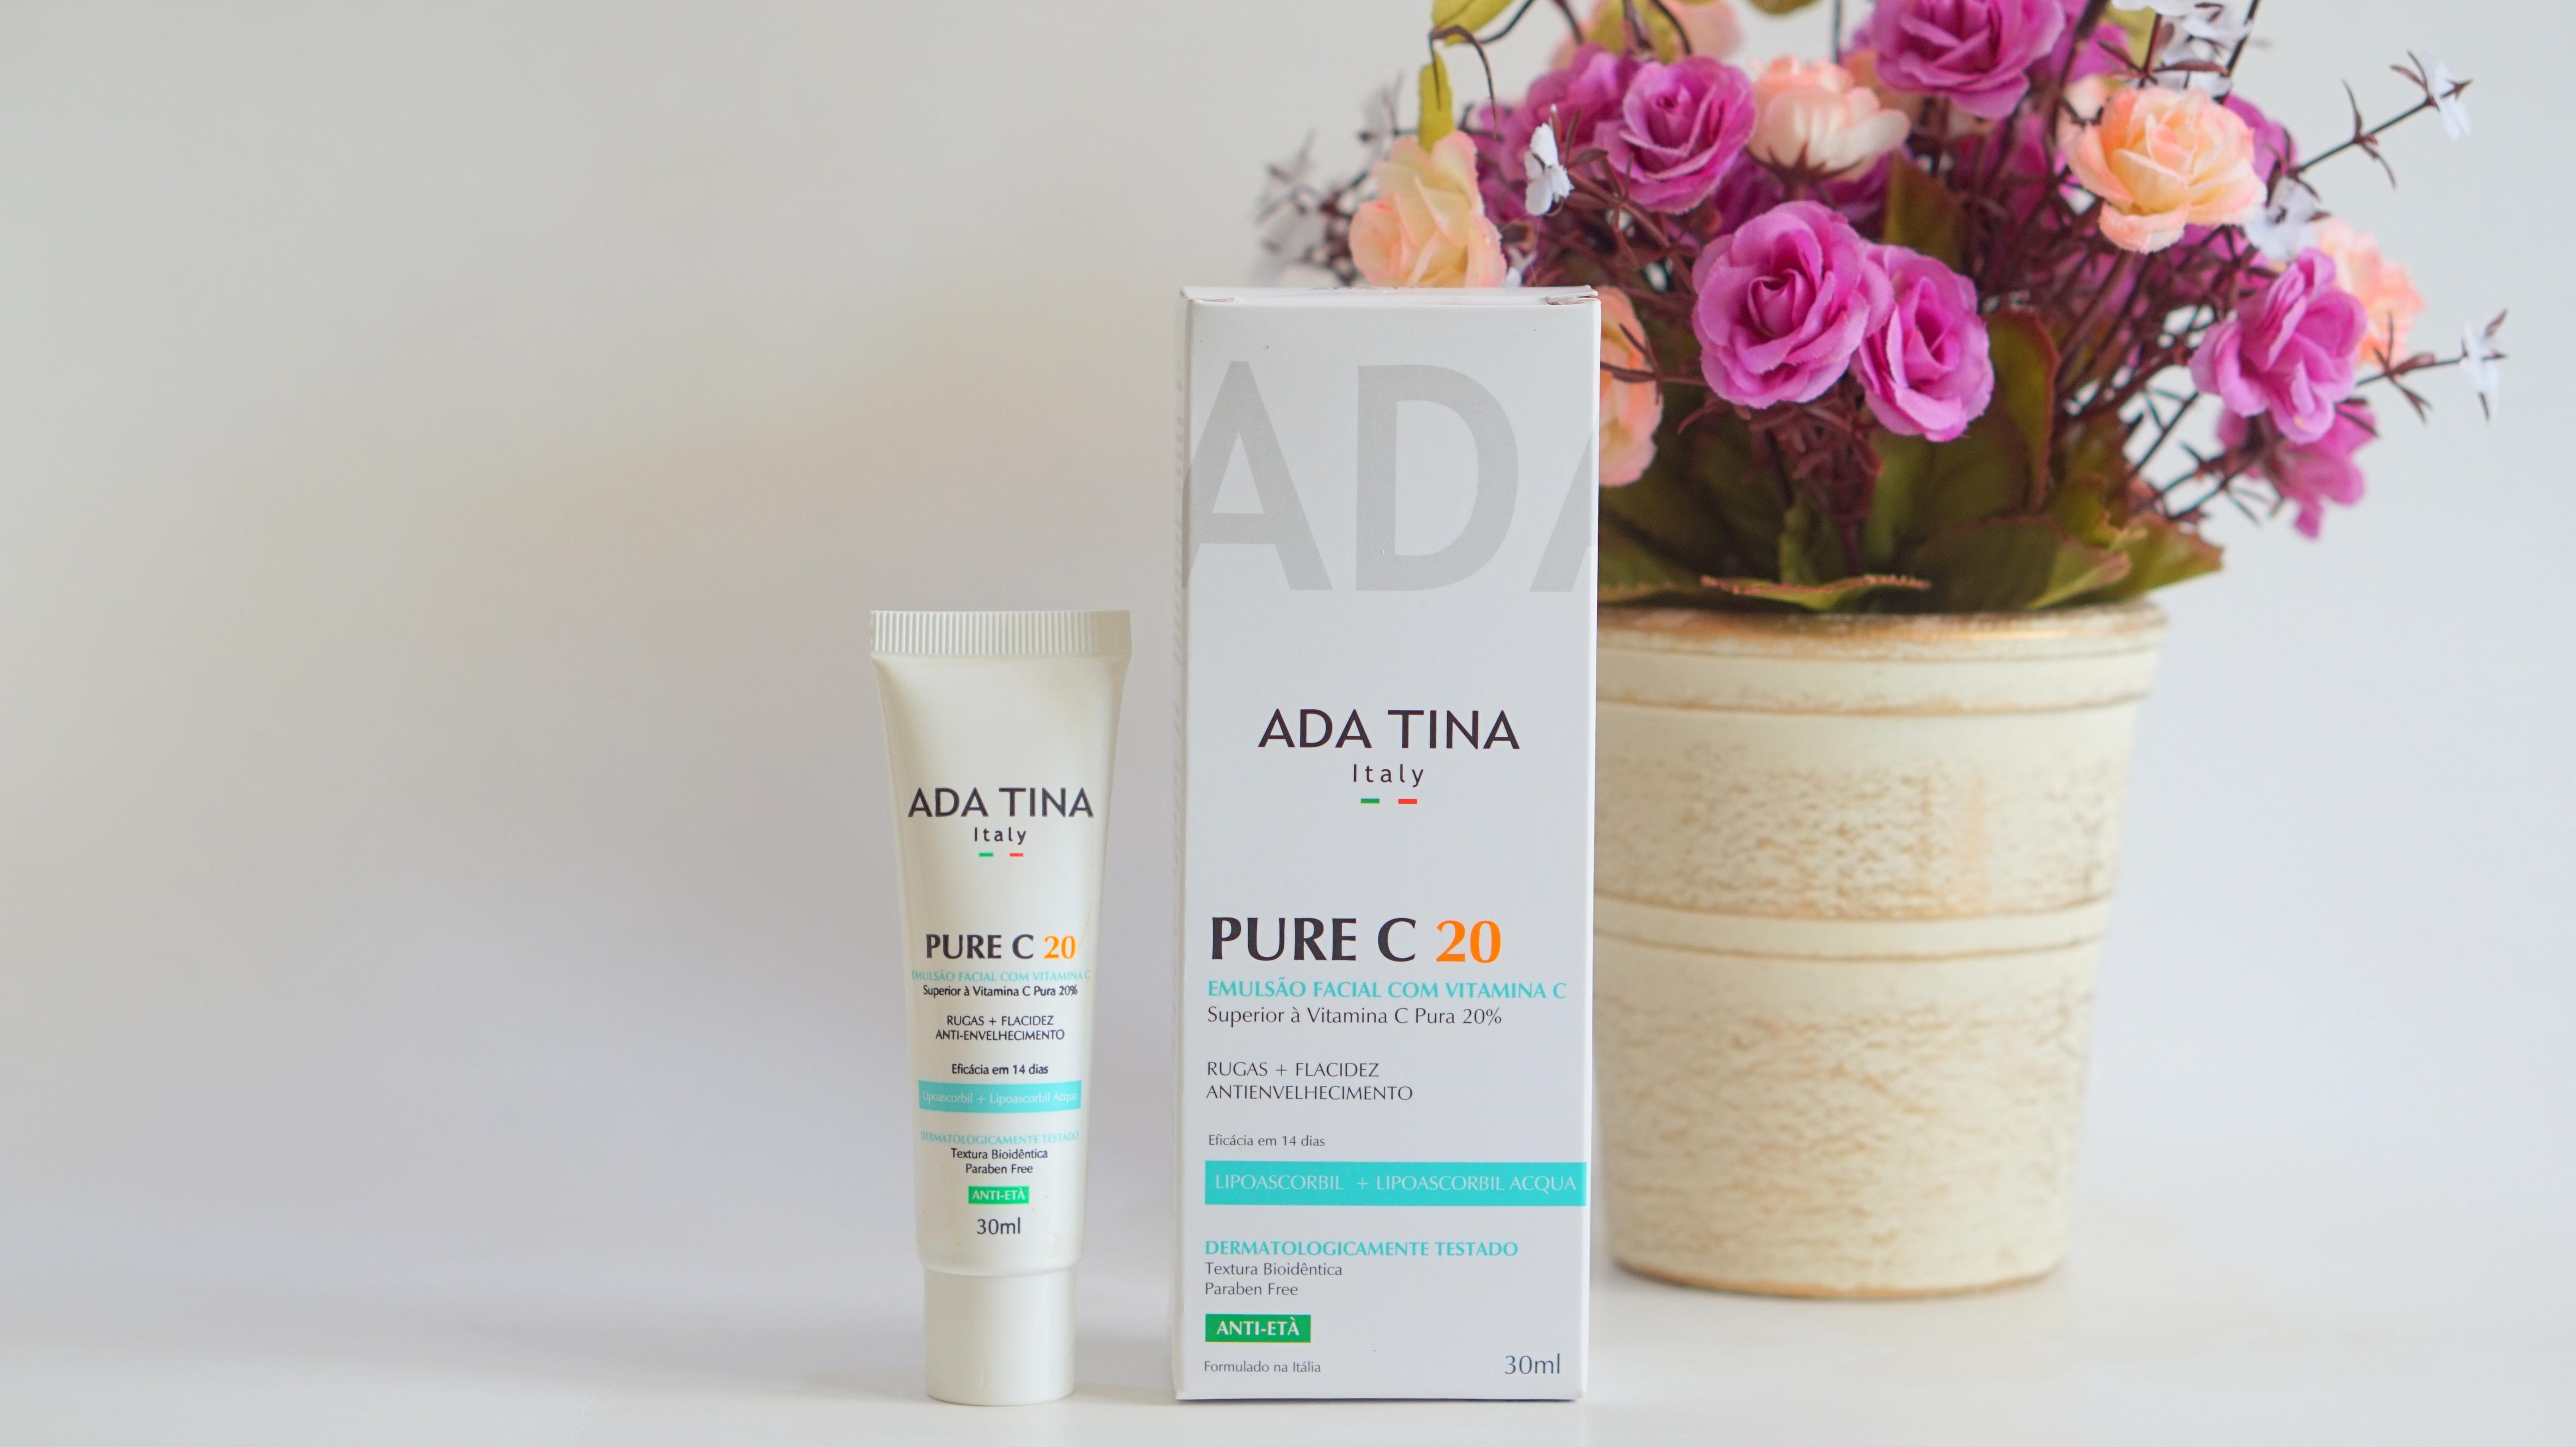 Pure C 20 Ada Tina Italy